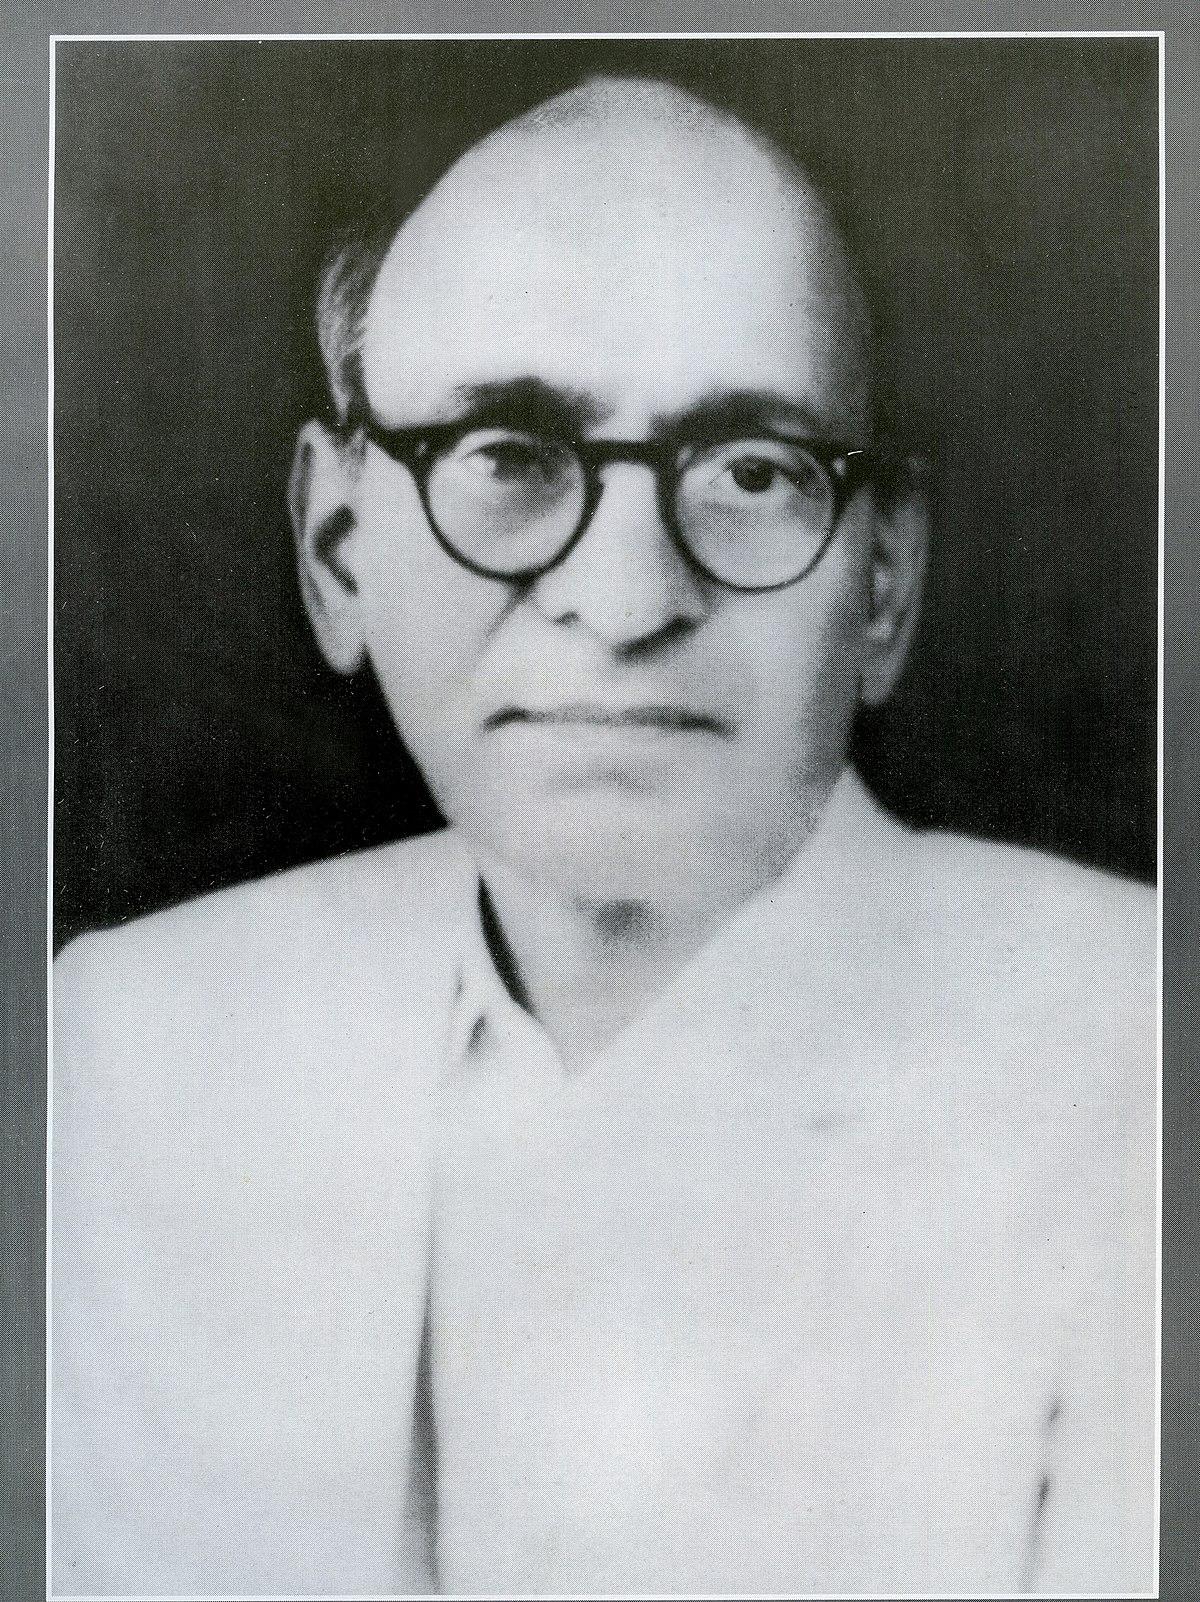 Short biography of Gopal Krishna Gokhale